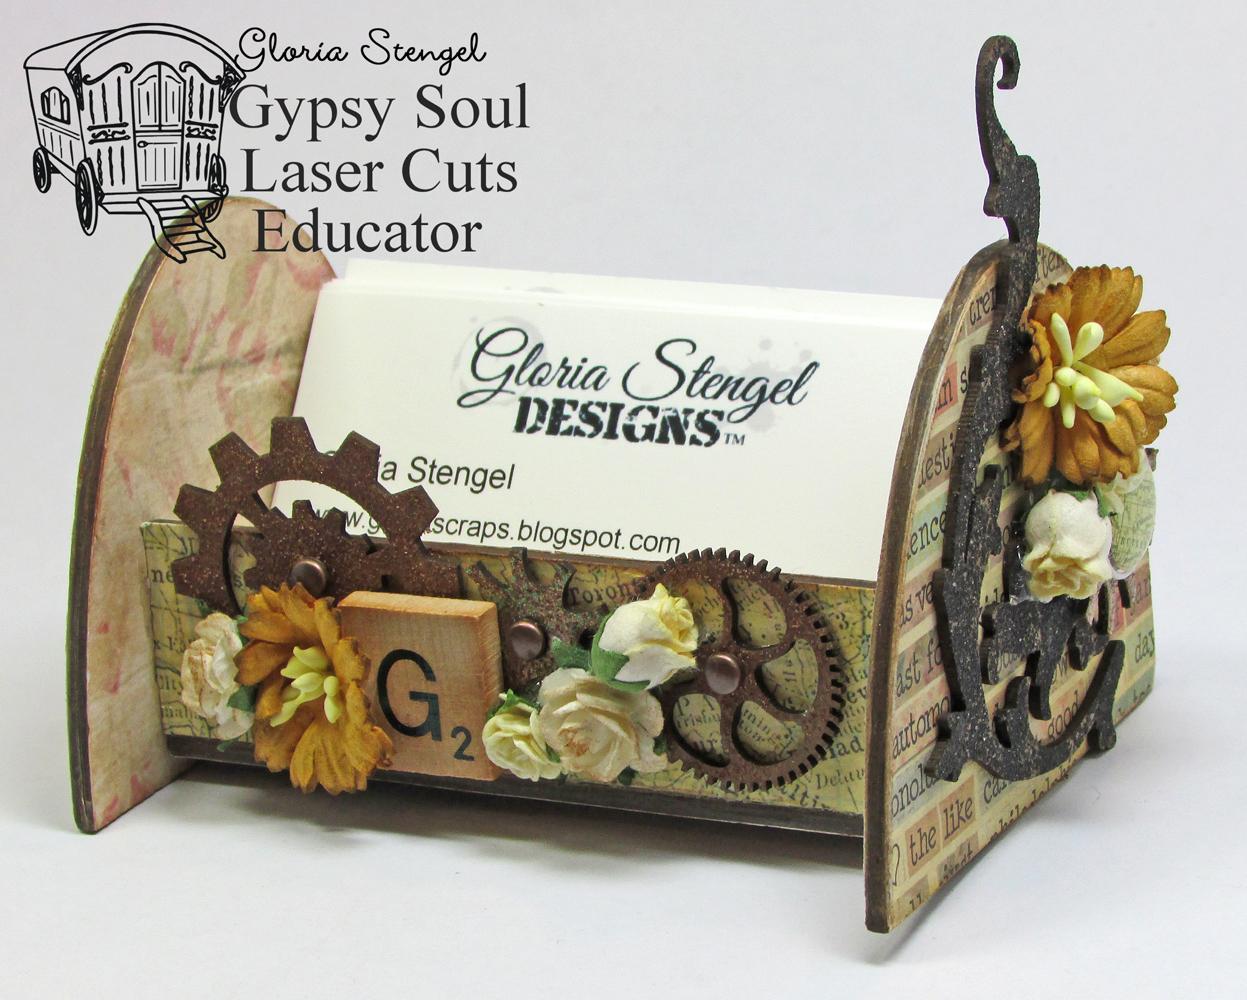 Gypsy Soul Laser Cuts: Business Card Holder by Gloria Stengel